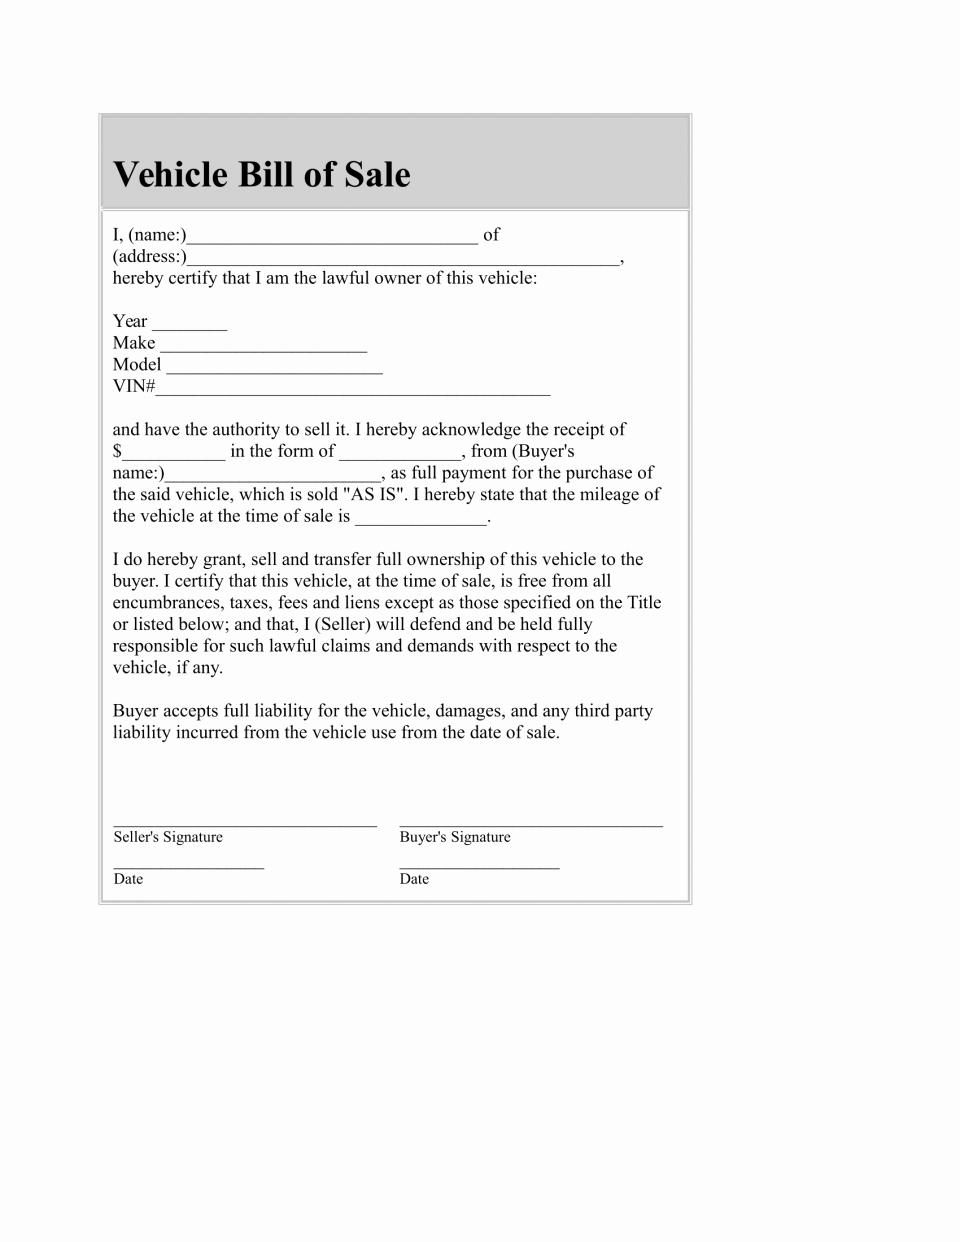 Bill Of Sale Fillable Pdf Awesome Automobile Bill Sale Template Pdf